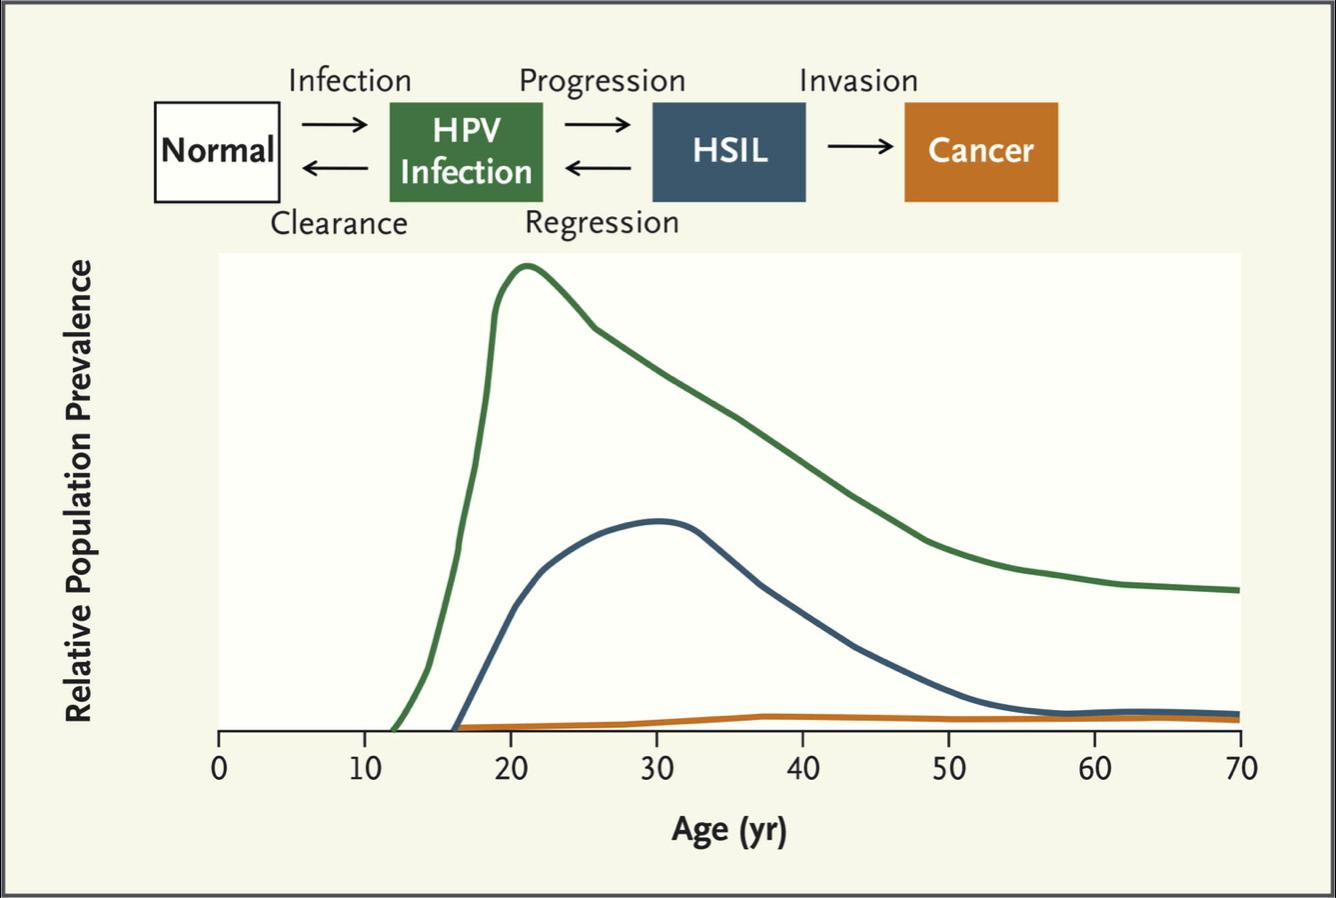 hpv wart progression cancer de pancreas y diabetes